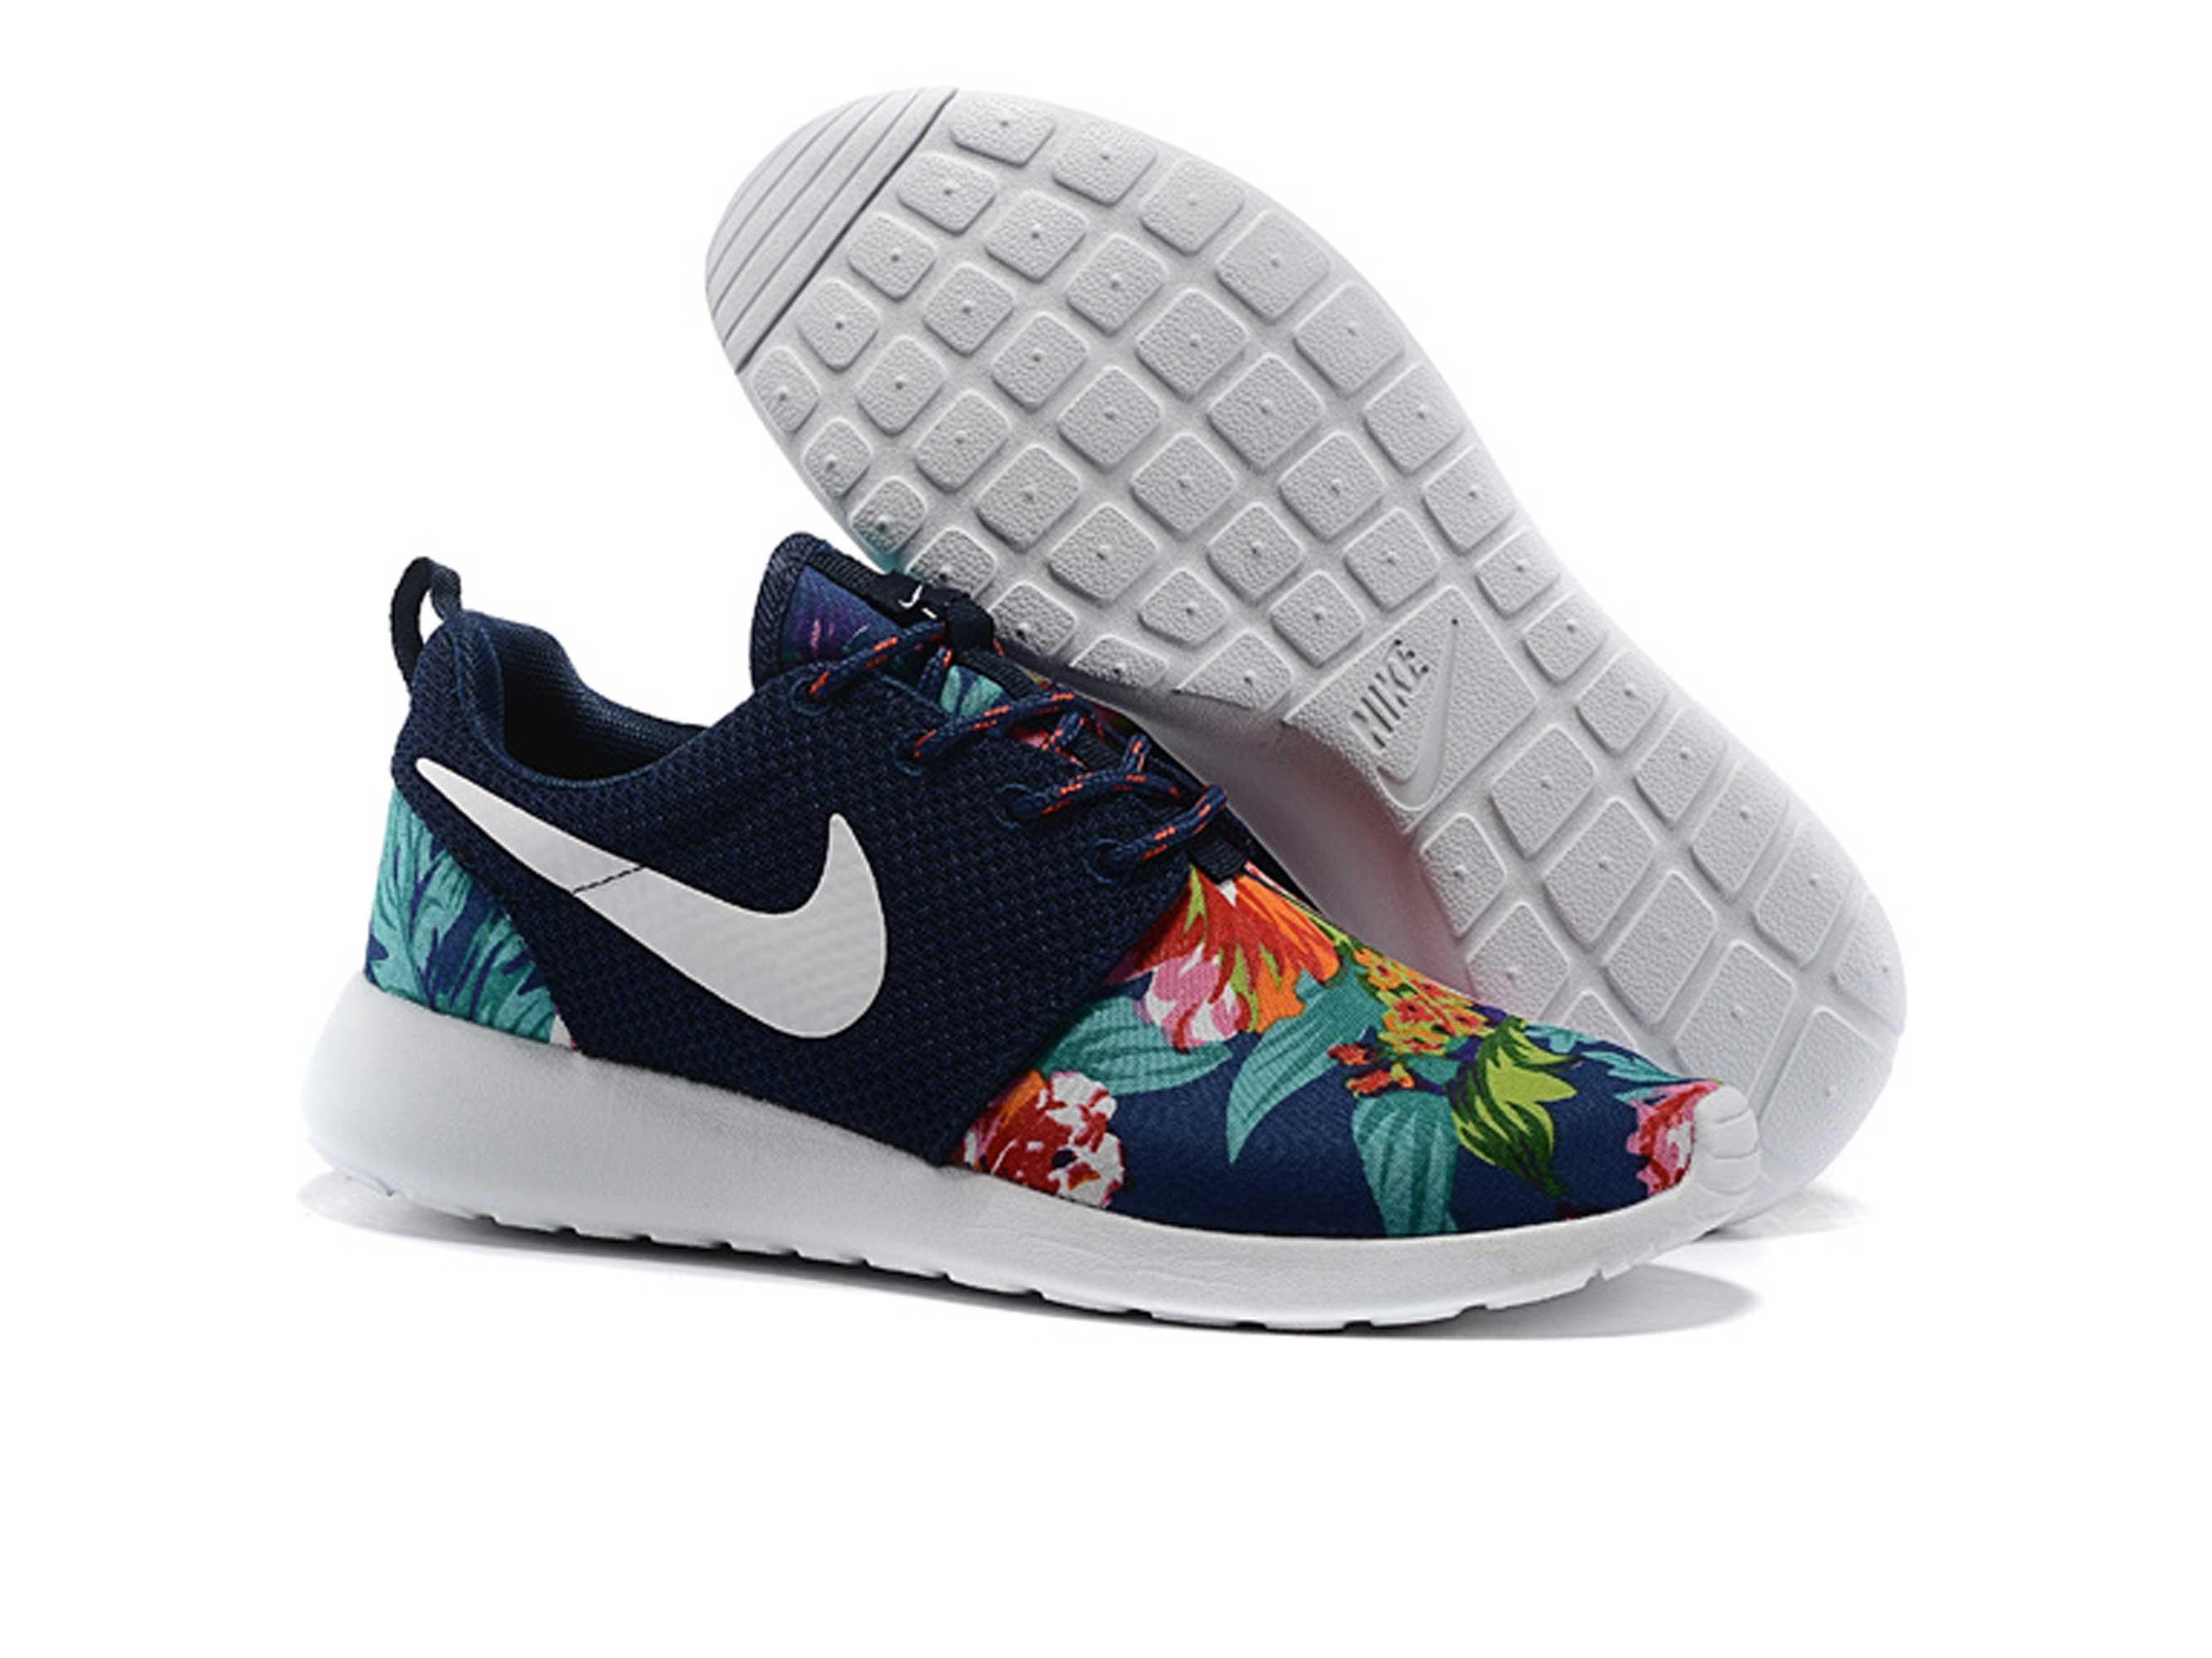 low priced 874b8 b54a2 nike roshe run floral dark blue